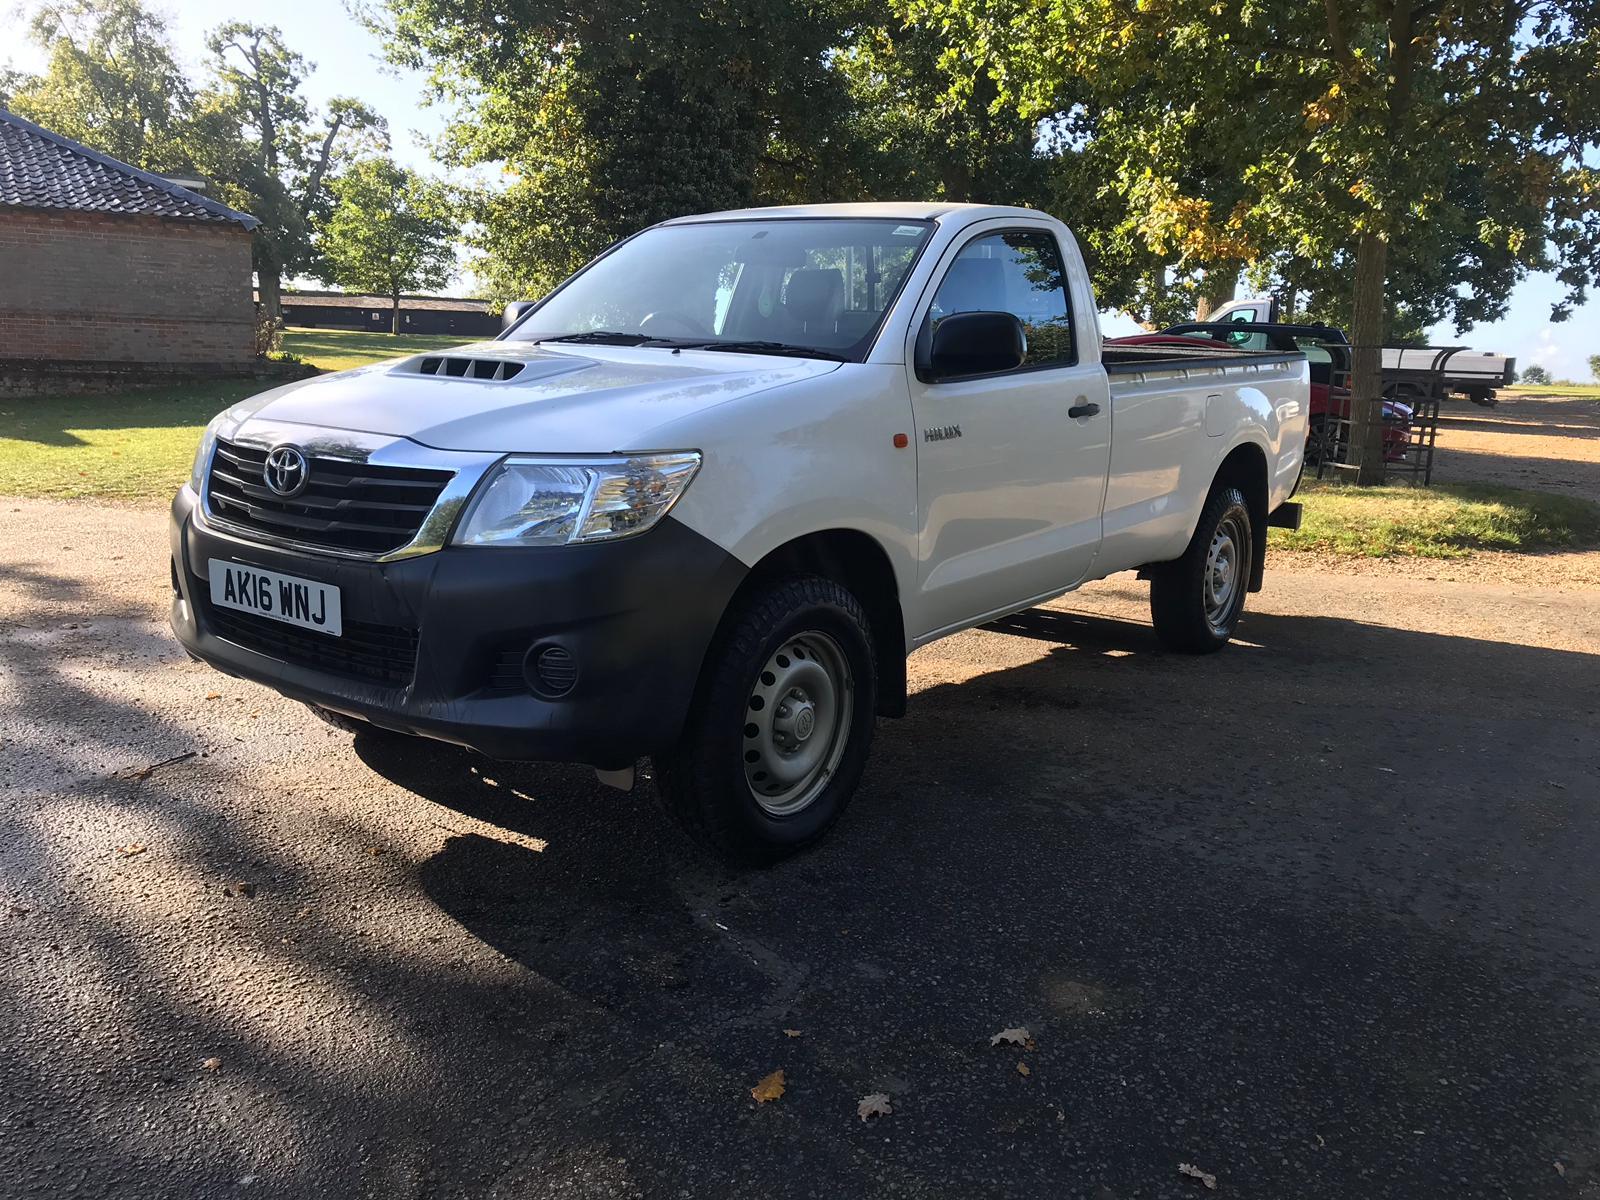 Lot 22 - Toyota Hi Lux, single cab, 2016, 25,266 miles, diesel, reg: AK16 WNJ, V5,